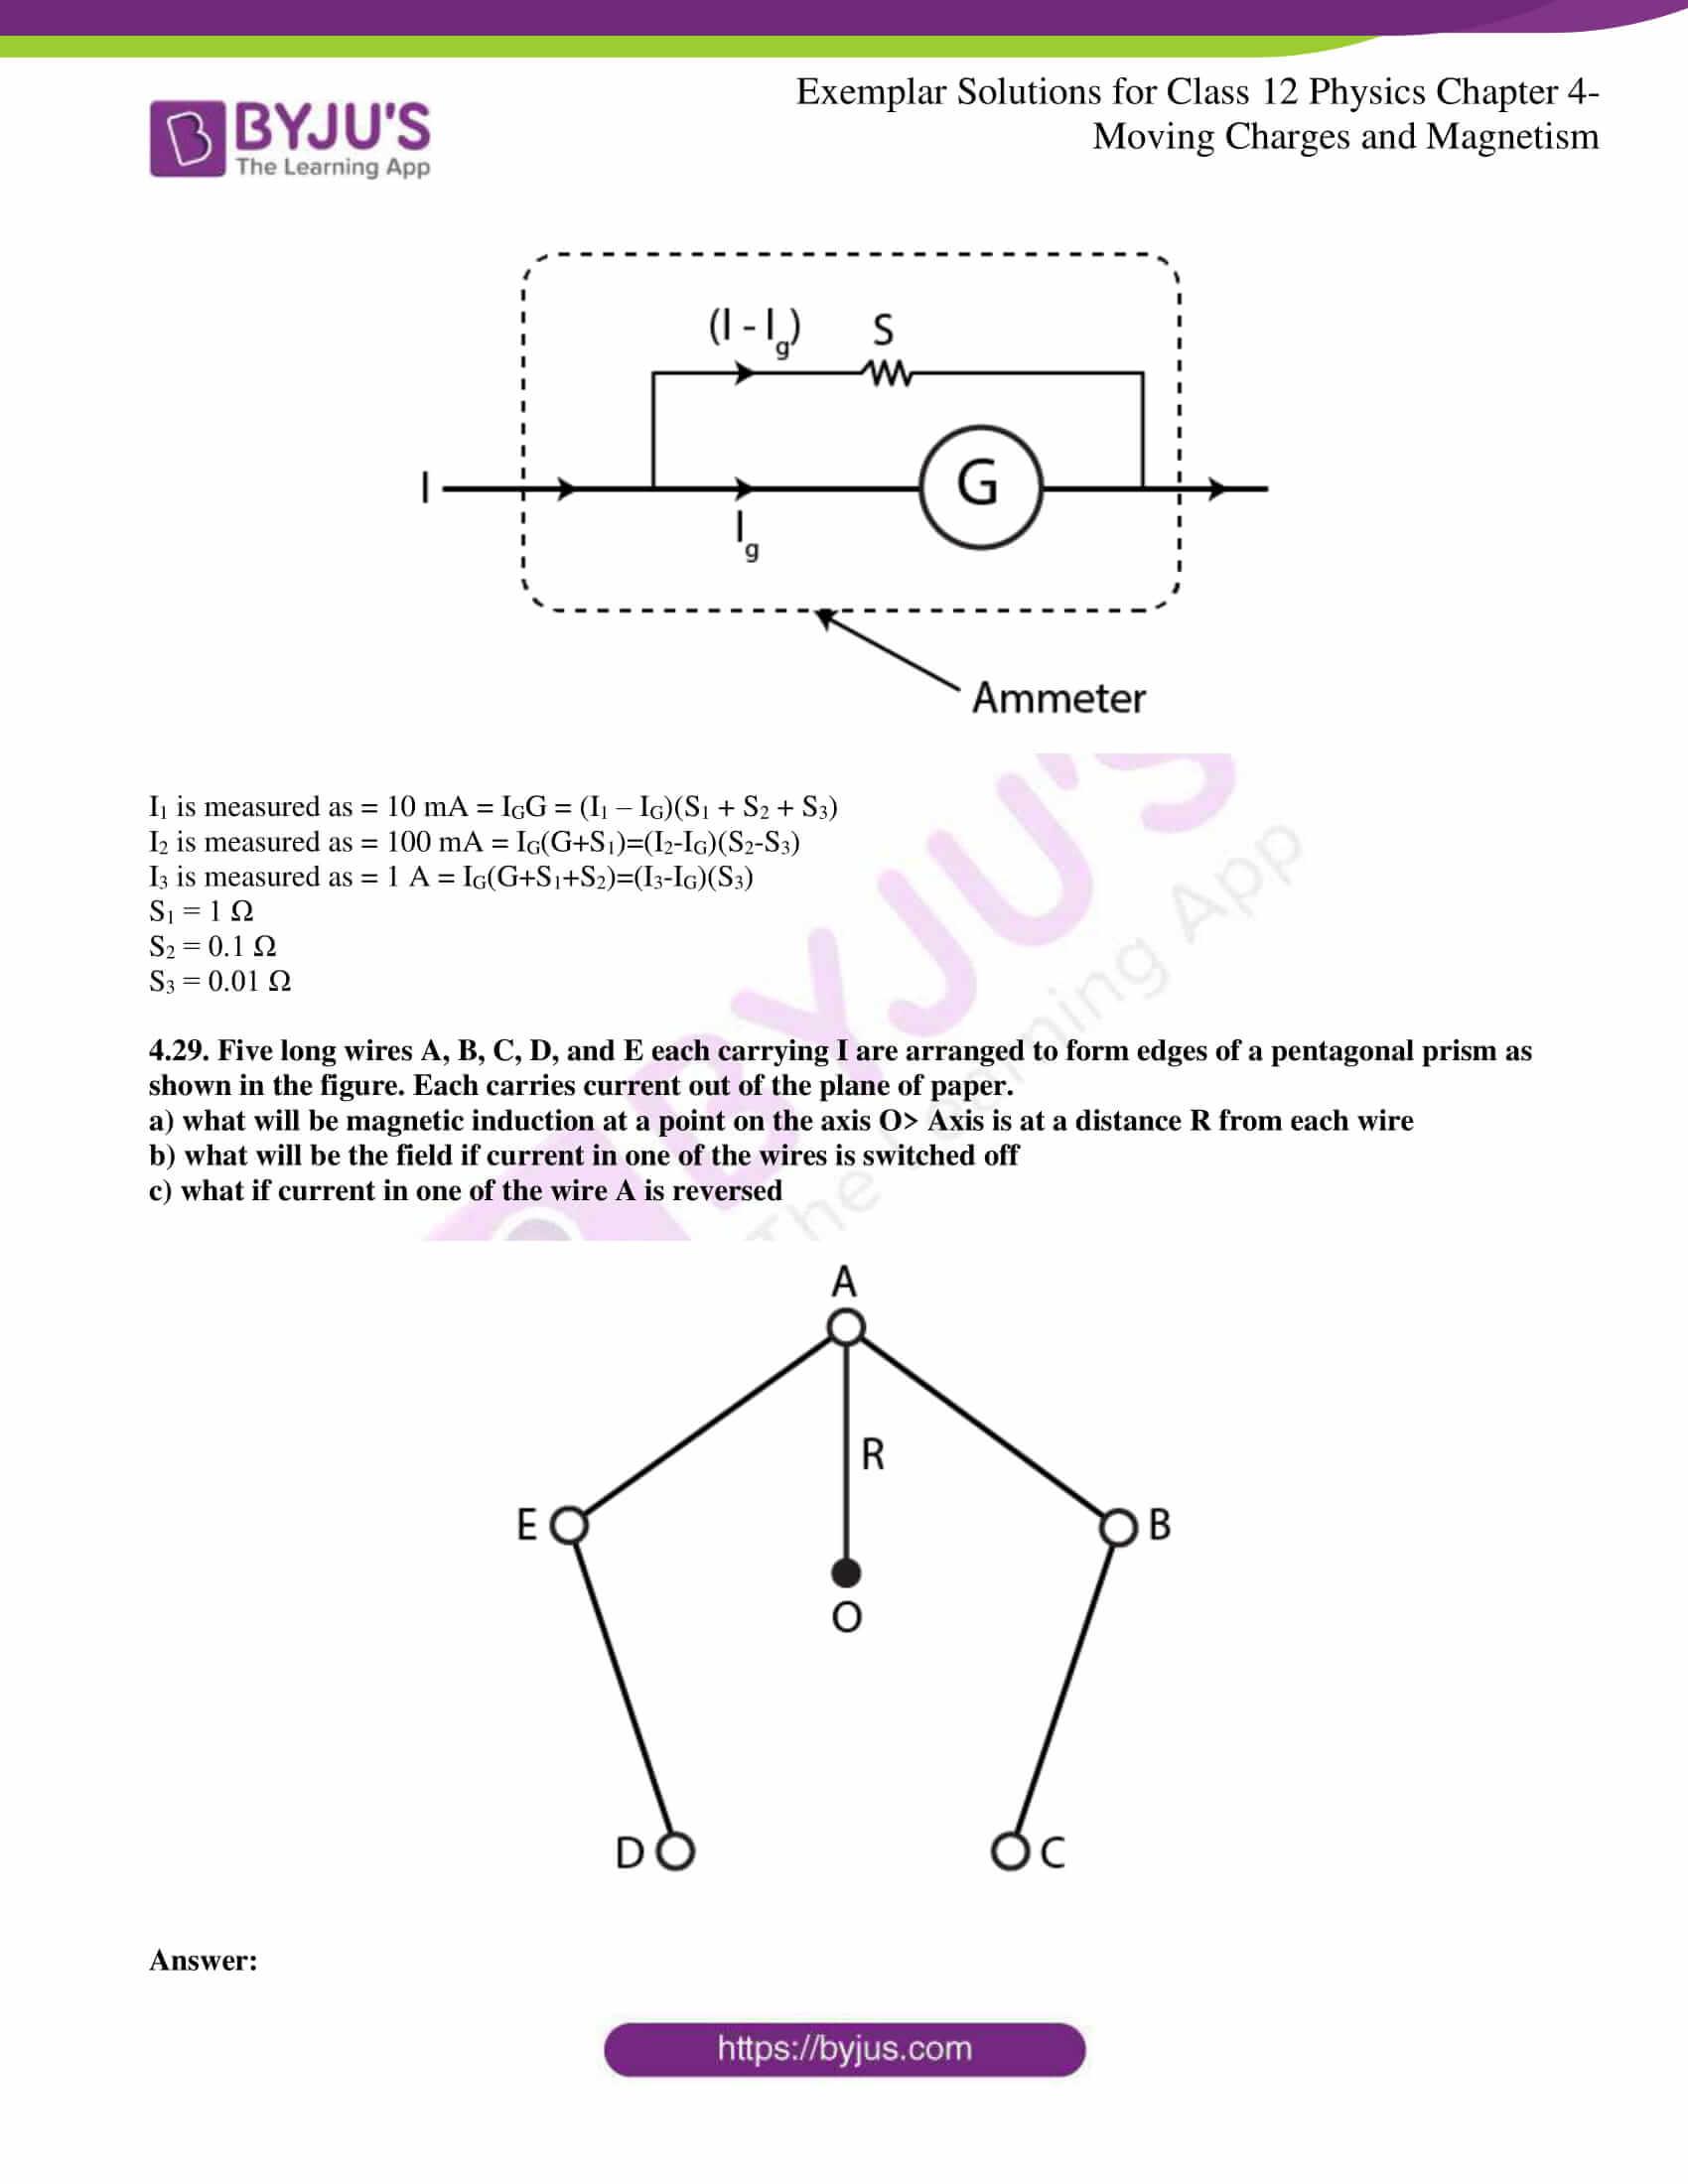 ncert exemplar solutions for class 12 physics chapter 4 12